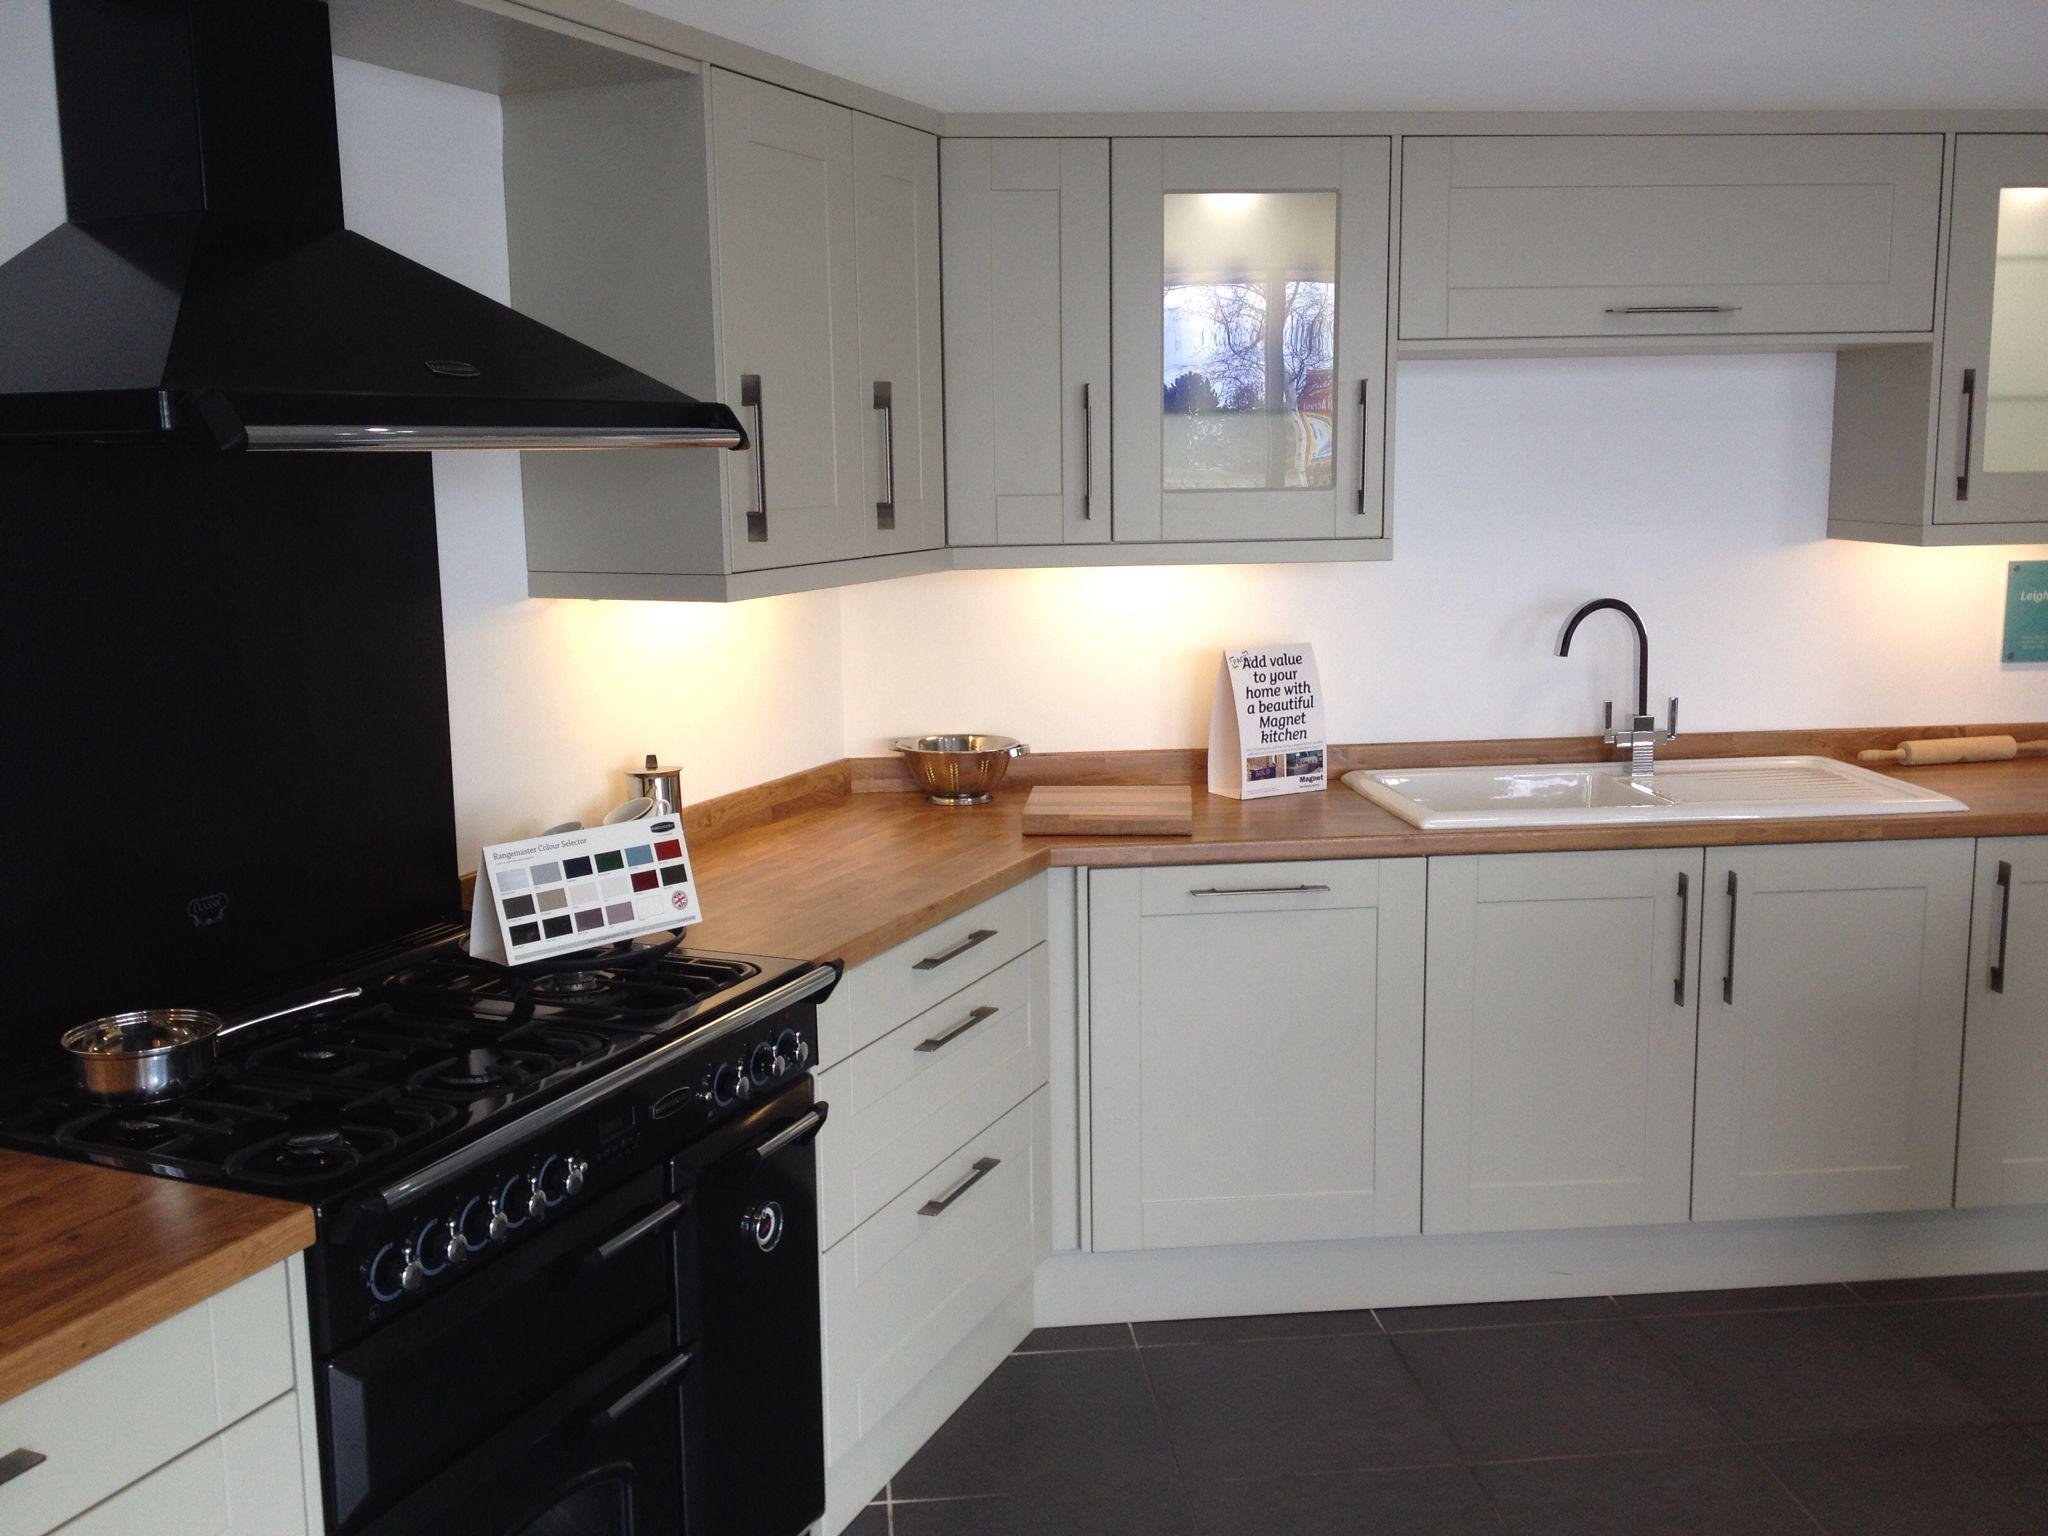 Leighton Grey Kitchen from Magnet | mutfak | Pinterest | Gray ...